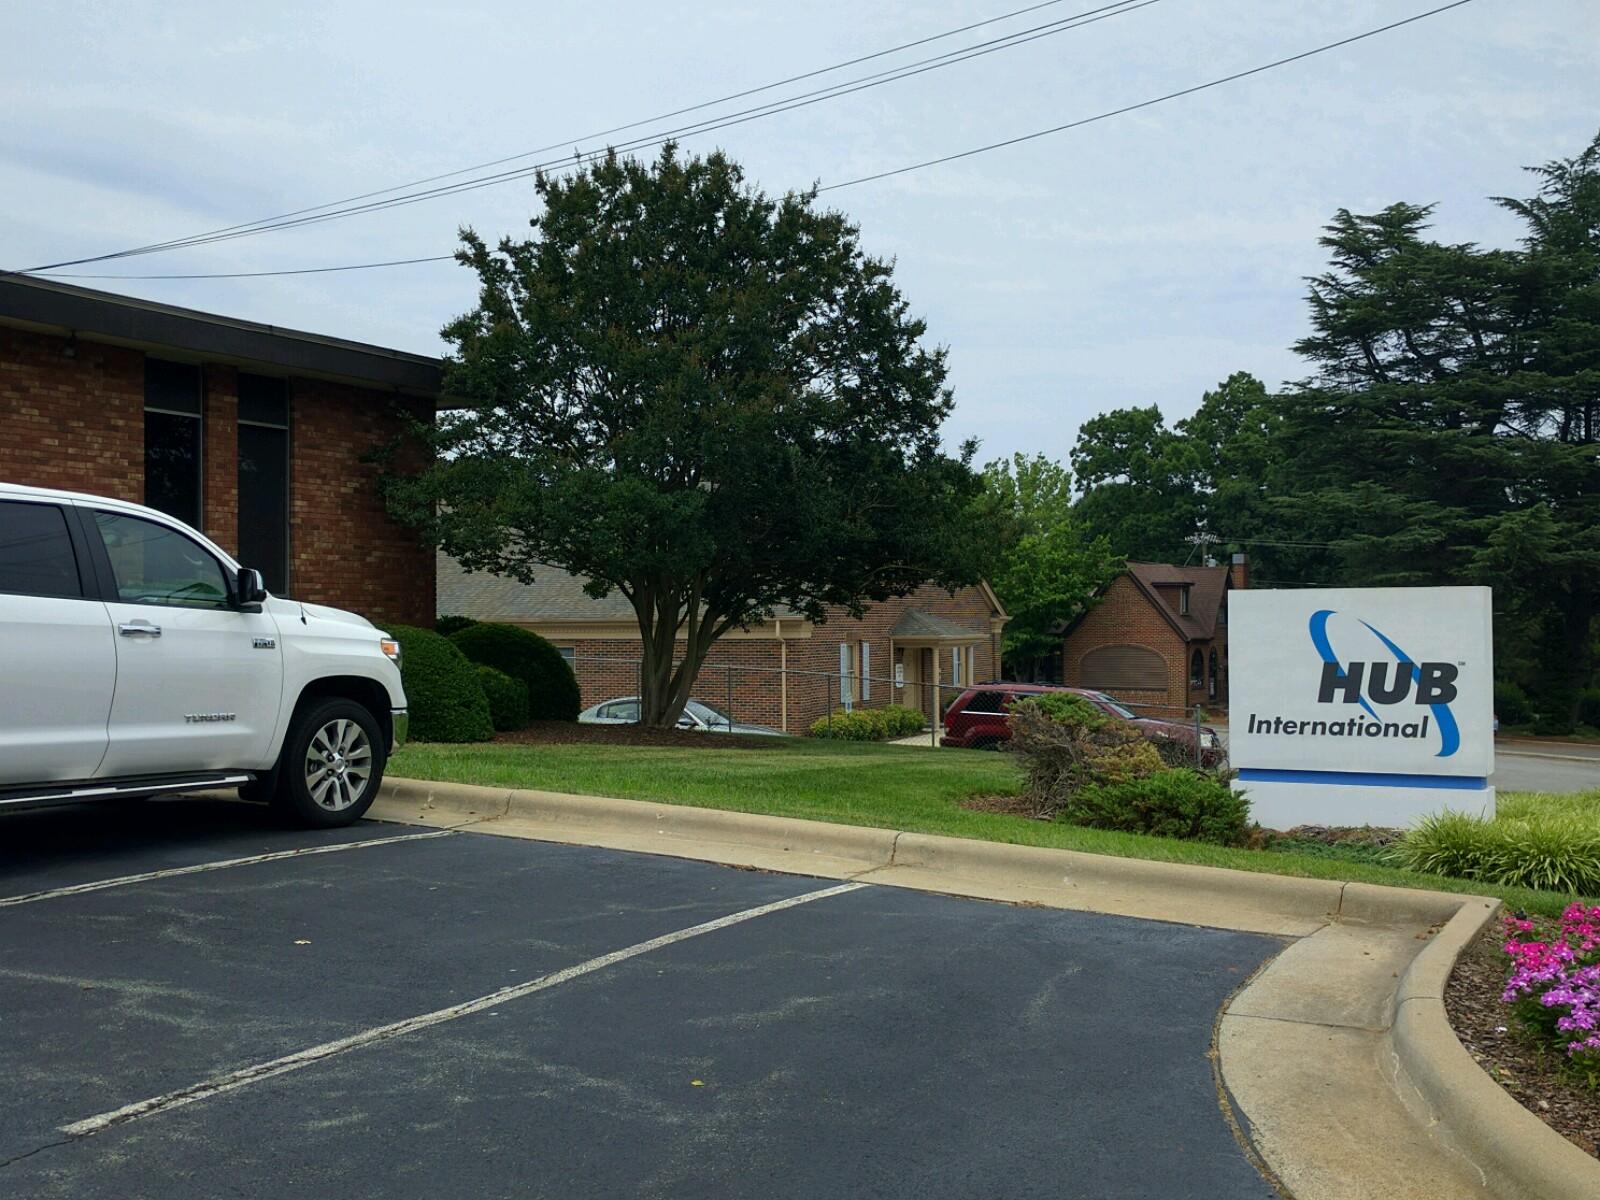 HUB International office in Burlington, North Carolina.